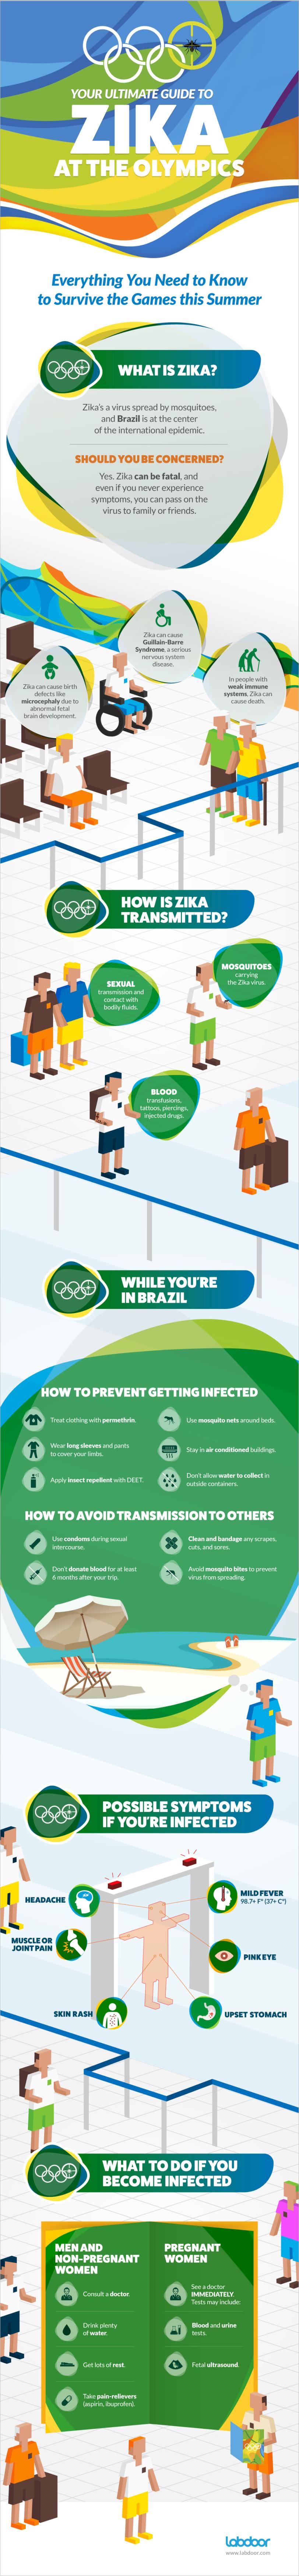 Zika Infographic - Zika at the Olympics